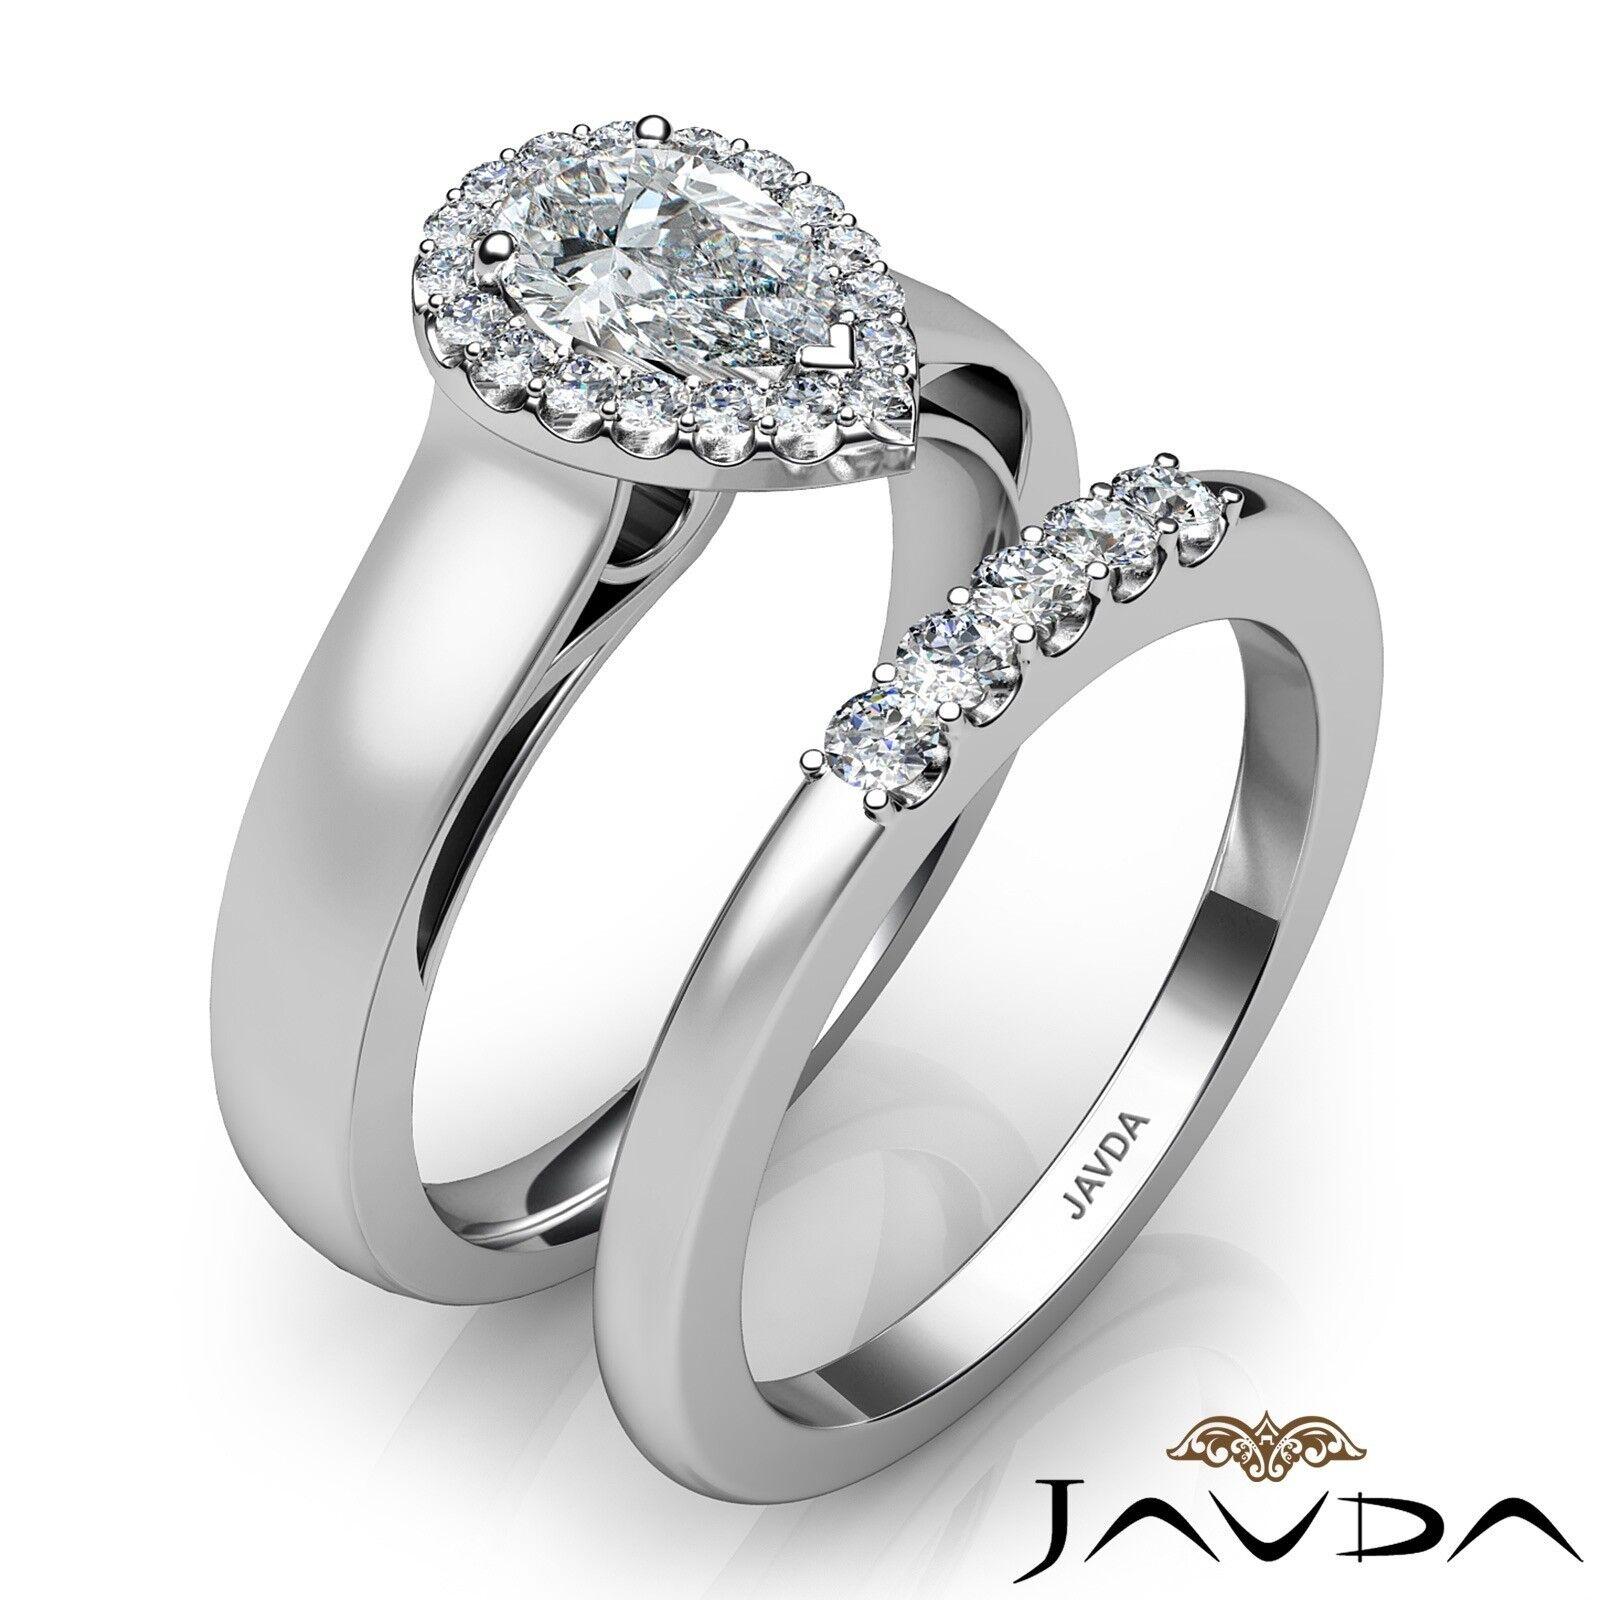 1.33ctw U Cut Pave Set Halo Bridal Pear Diamond Engagement Ring GIA F-VS2 W Gold 2